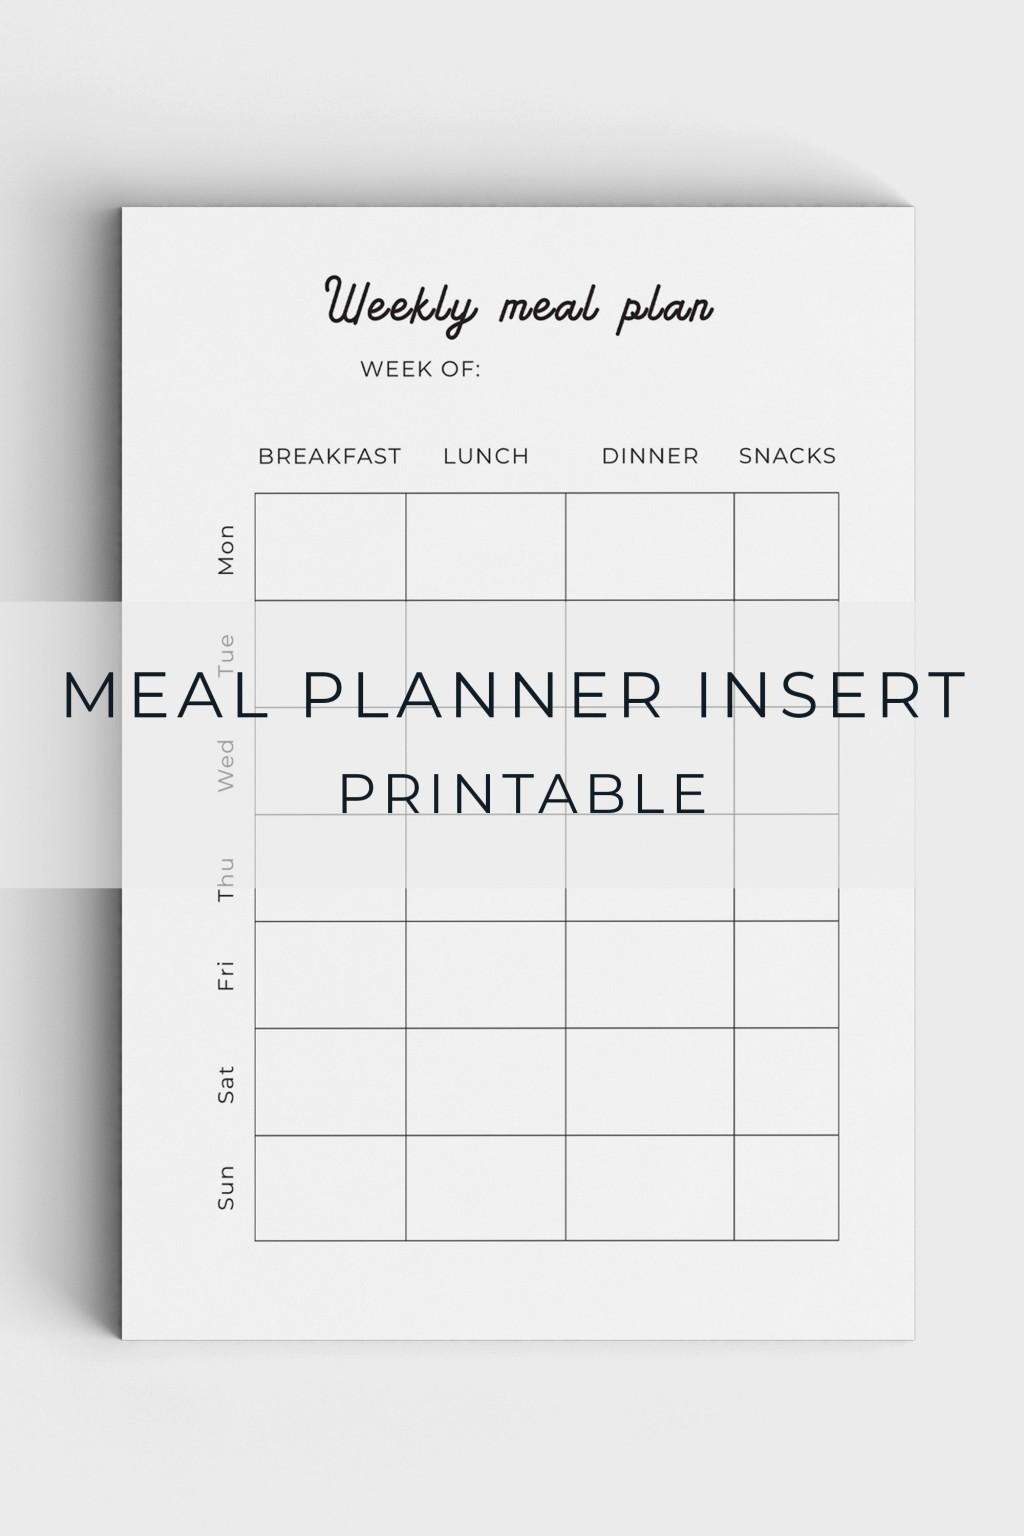 005 Unforgettable Meal Plan Printable Pdf Image  Worksheet Downloadable Template SheetLarge